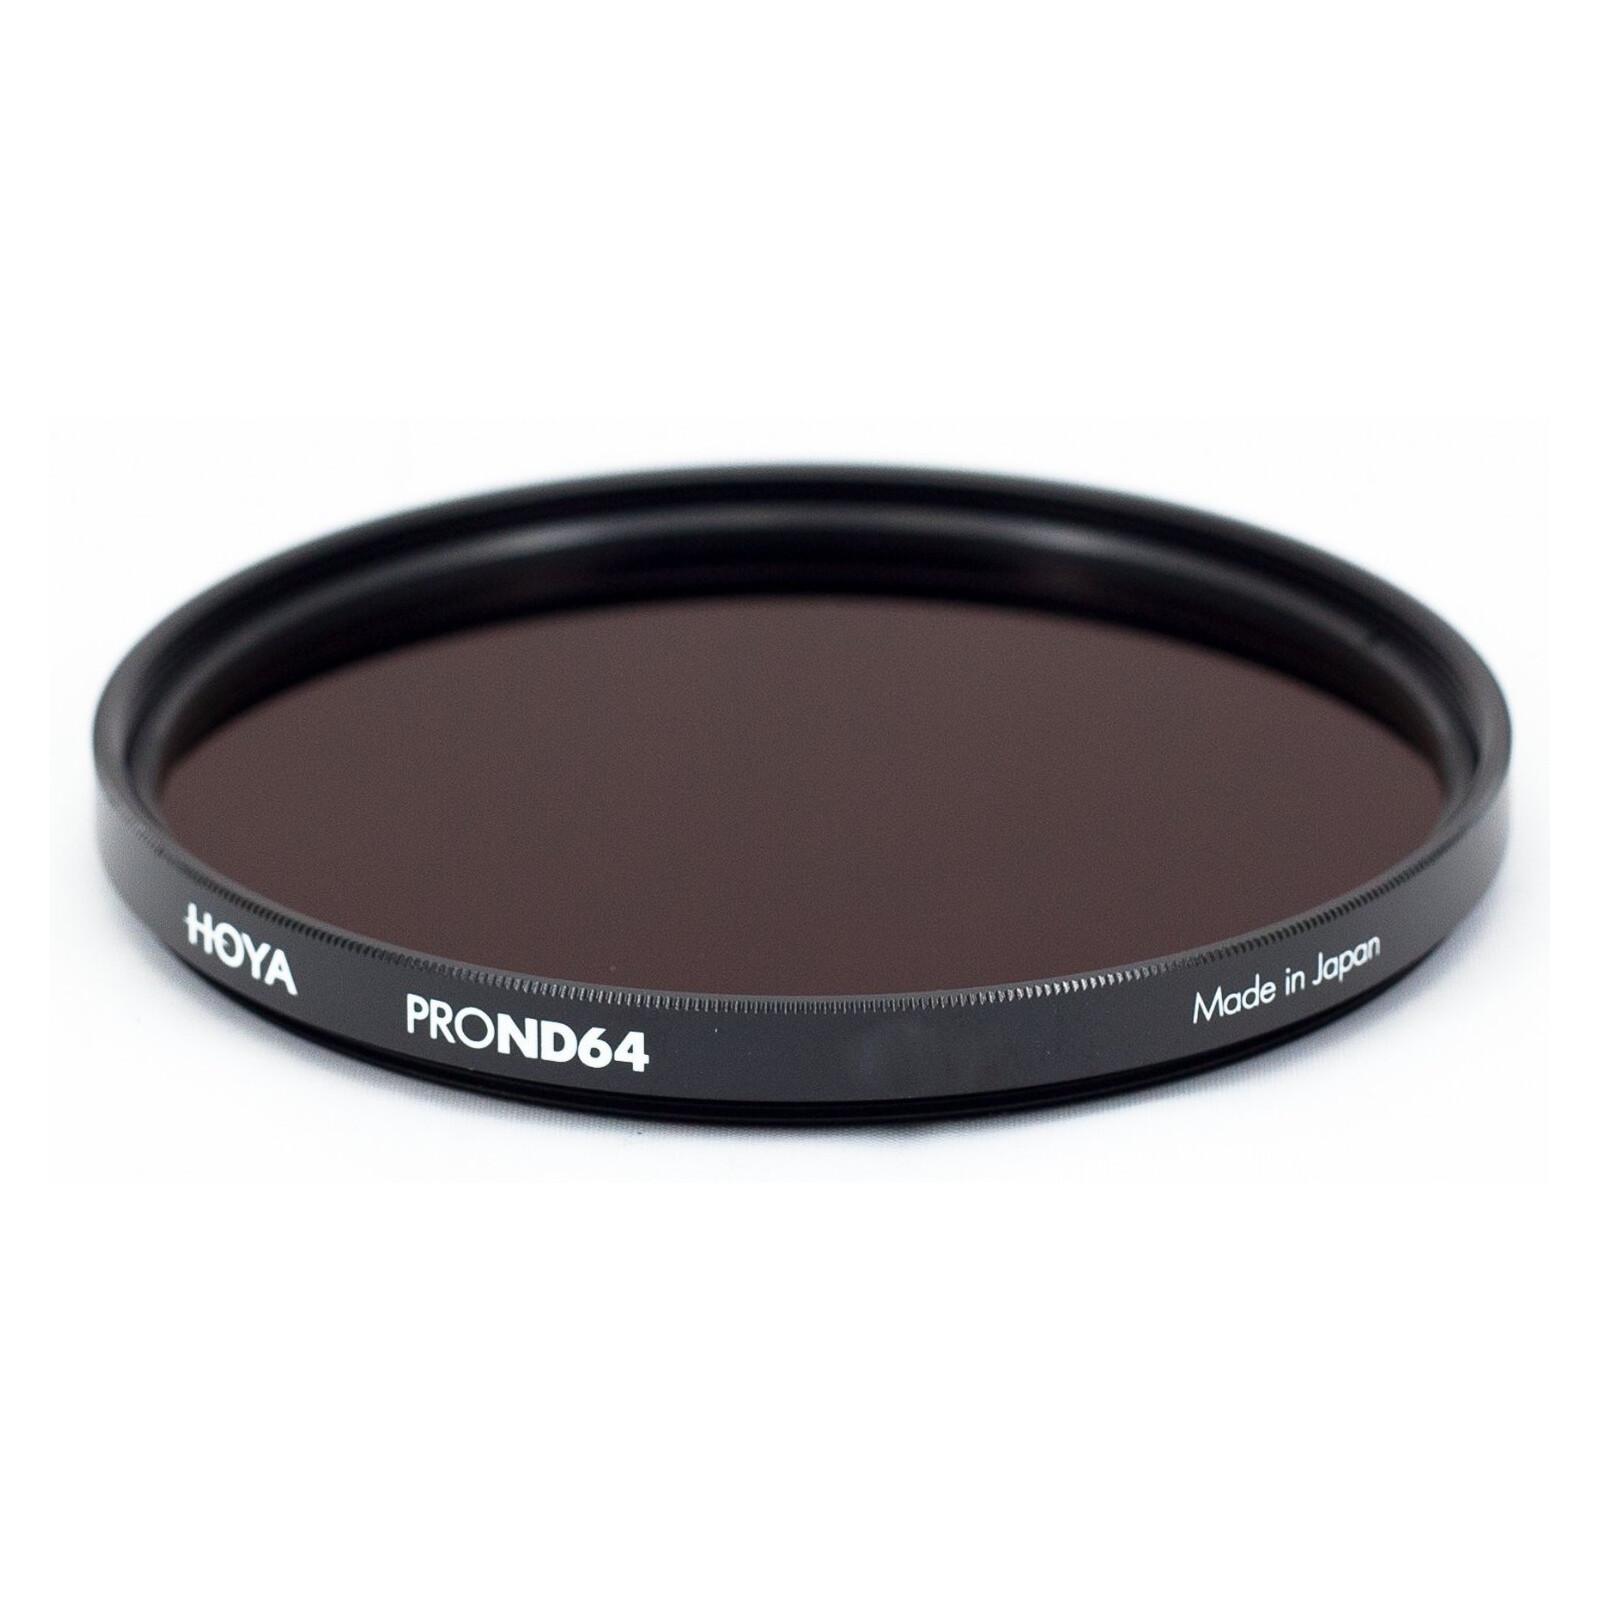 Hoya Grau PRO ND 4 67mm